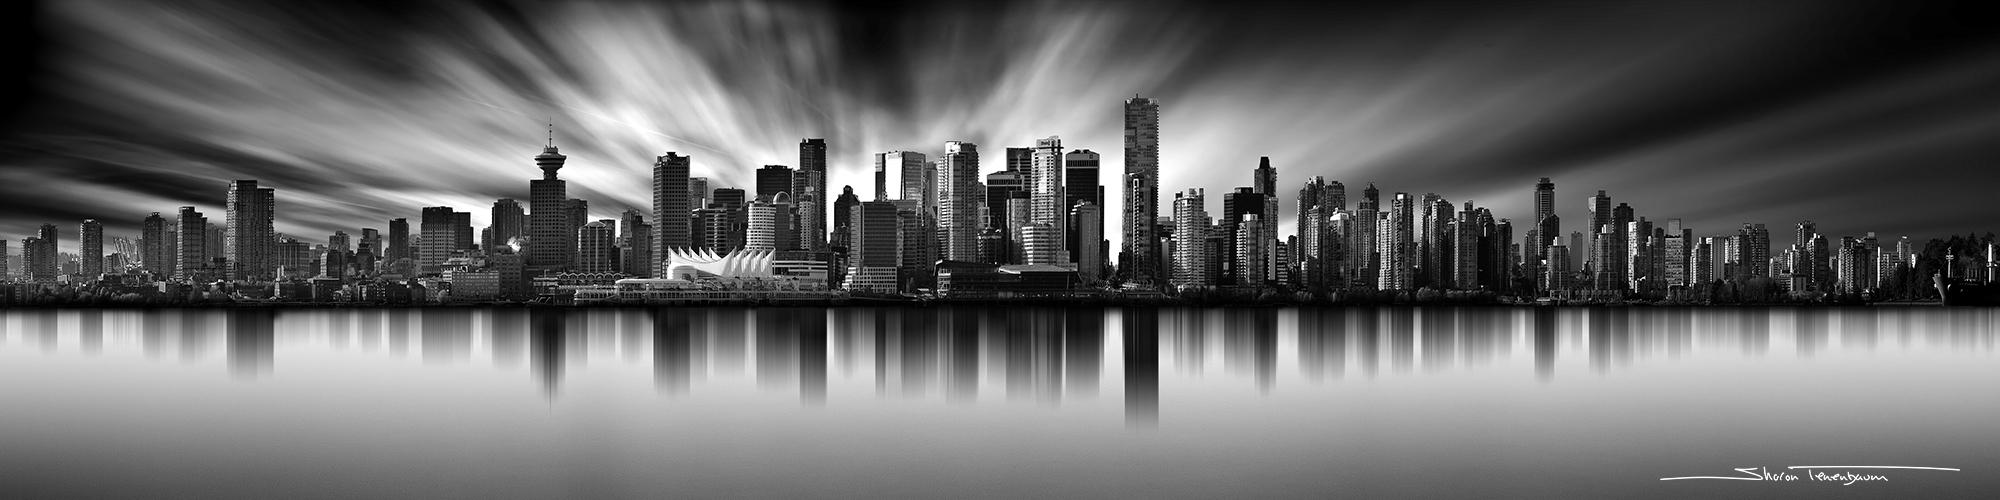 Vancouver Skyline Original Black and White Photograph